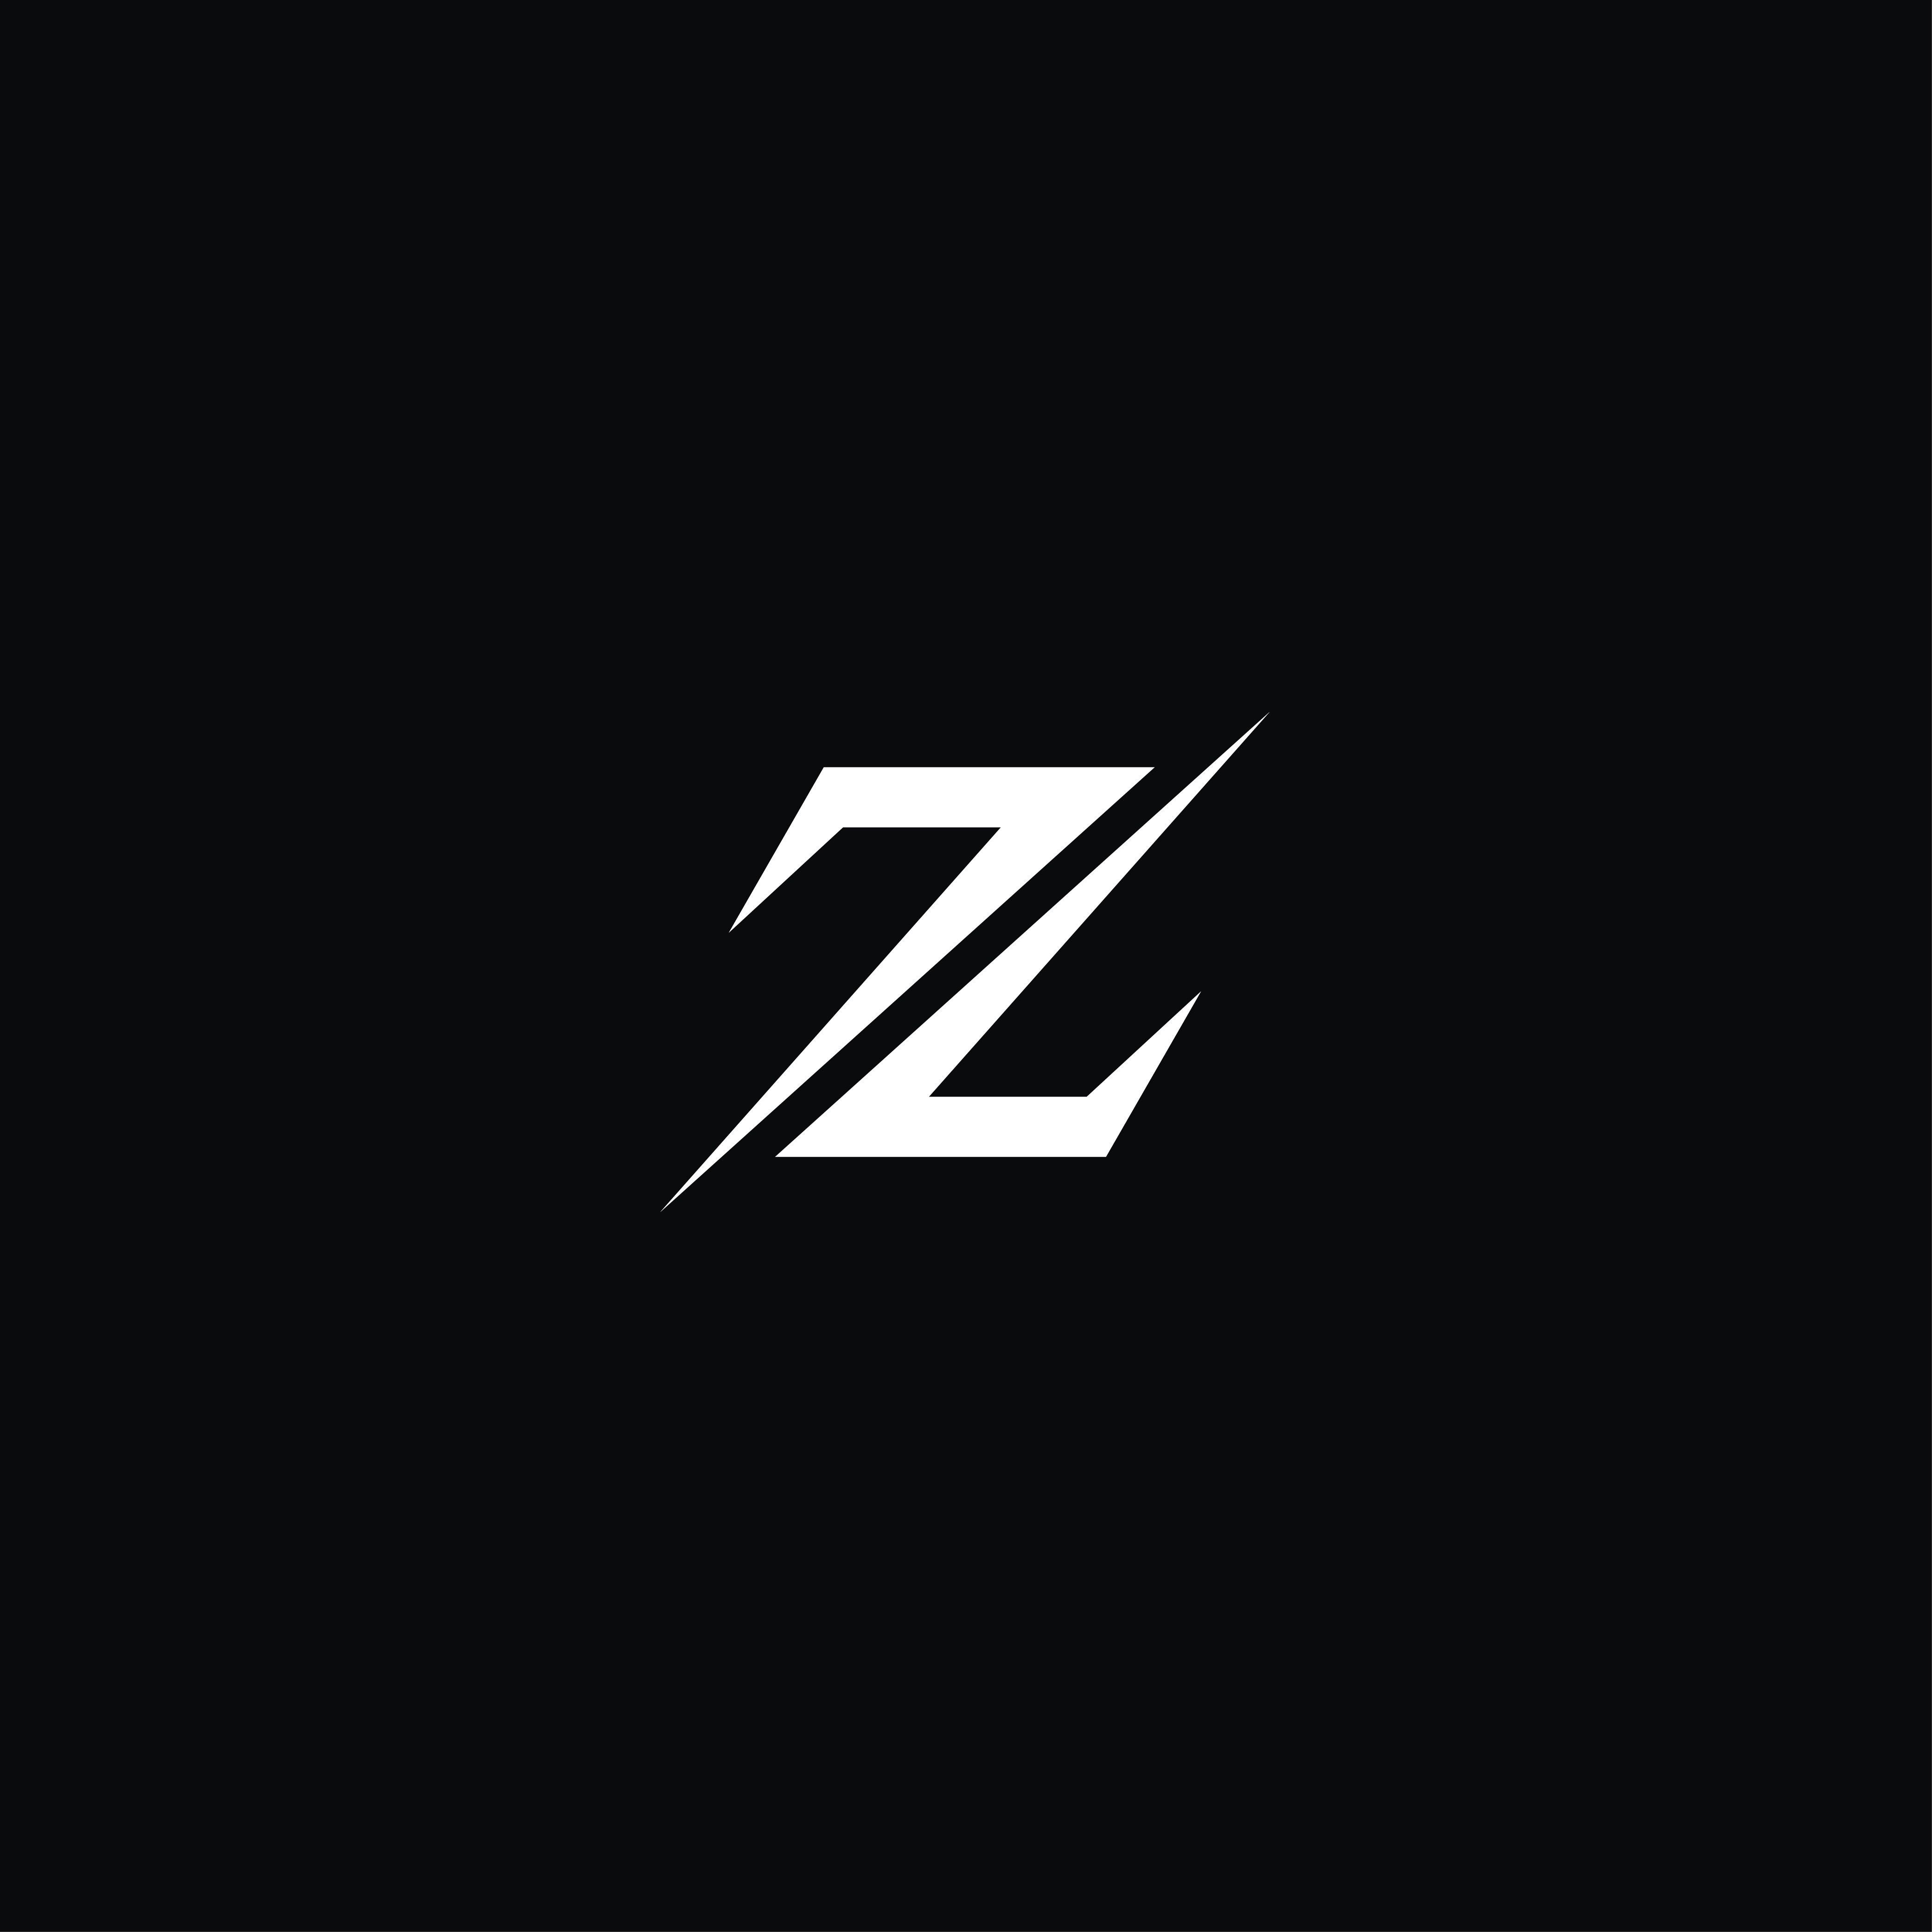 Download Creative letter Z logo concept design templates